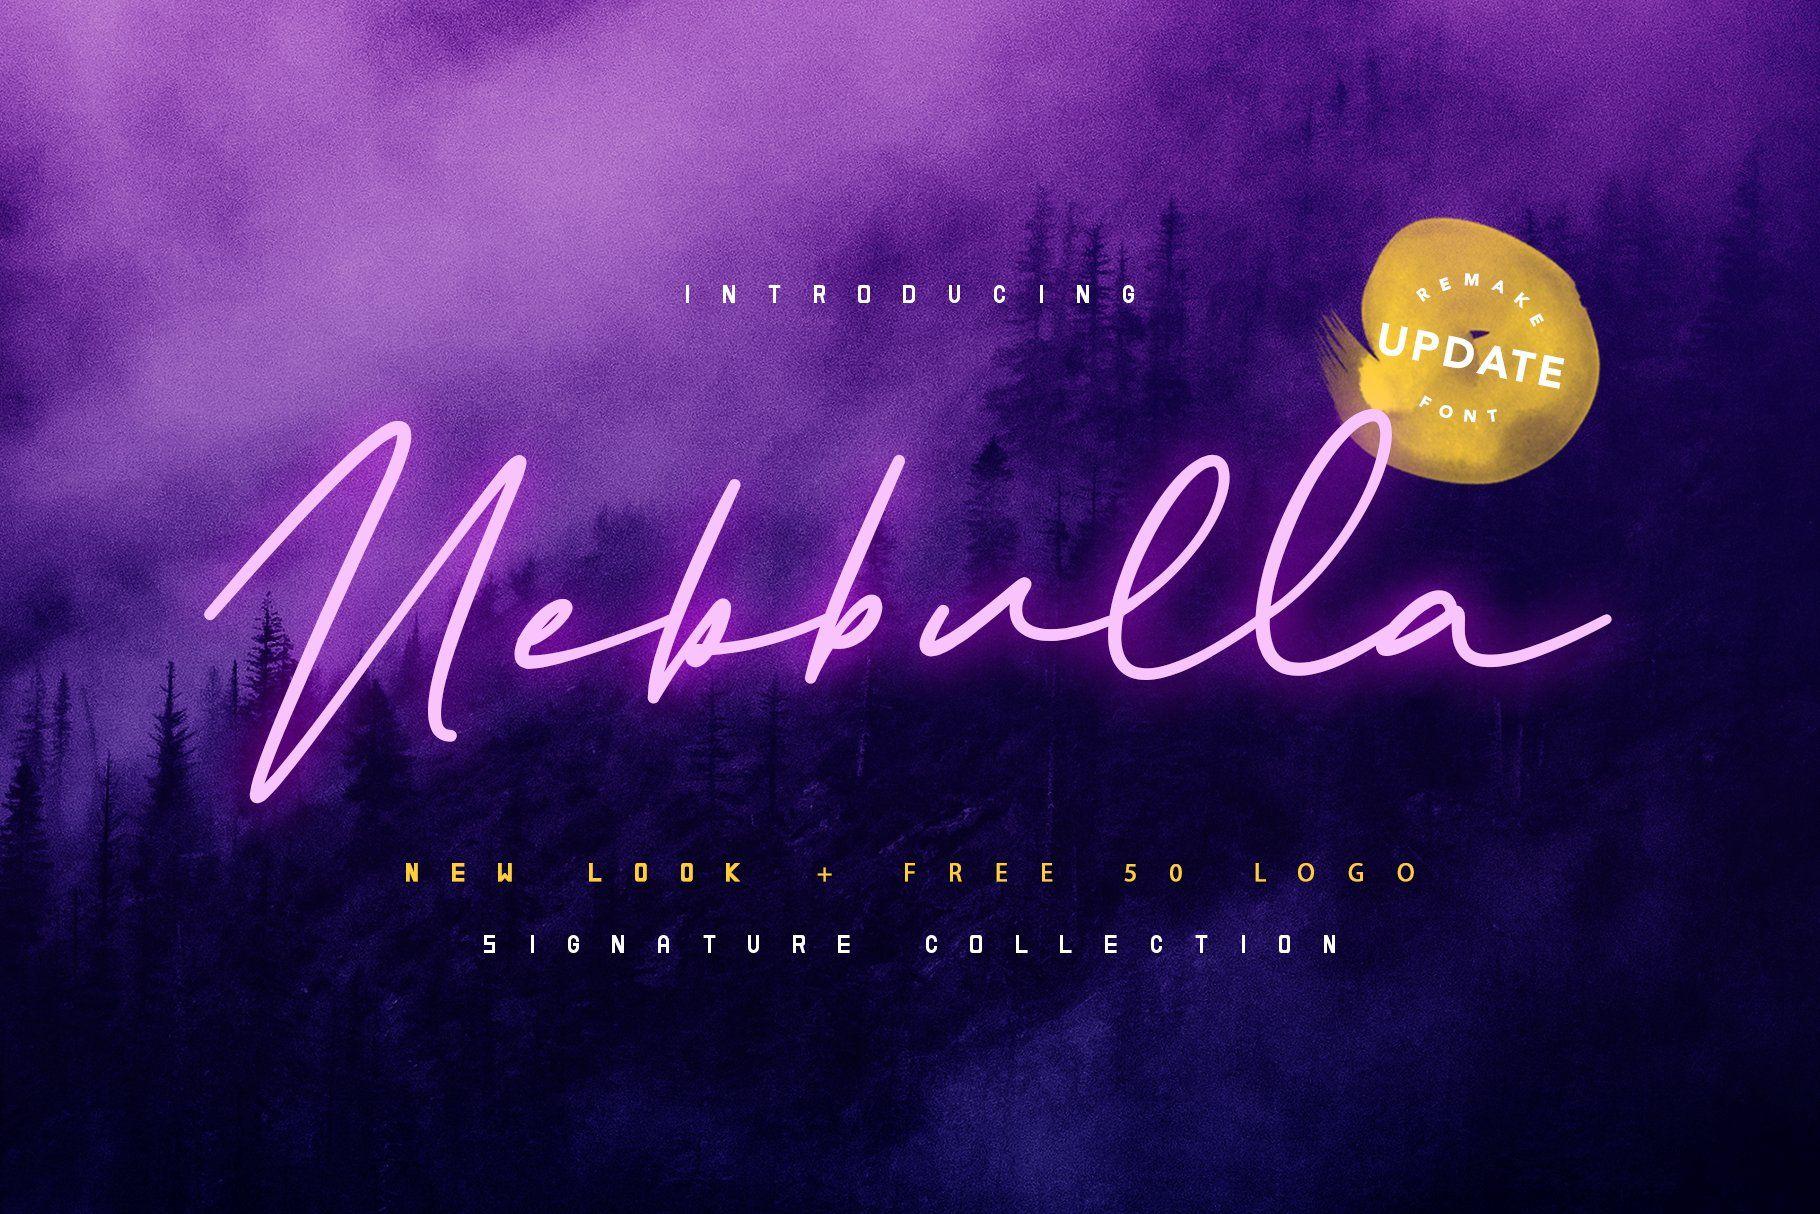 Nebbulla + 50 Minimalist Logo (With images) Minimalist